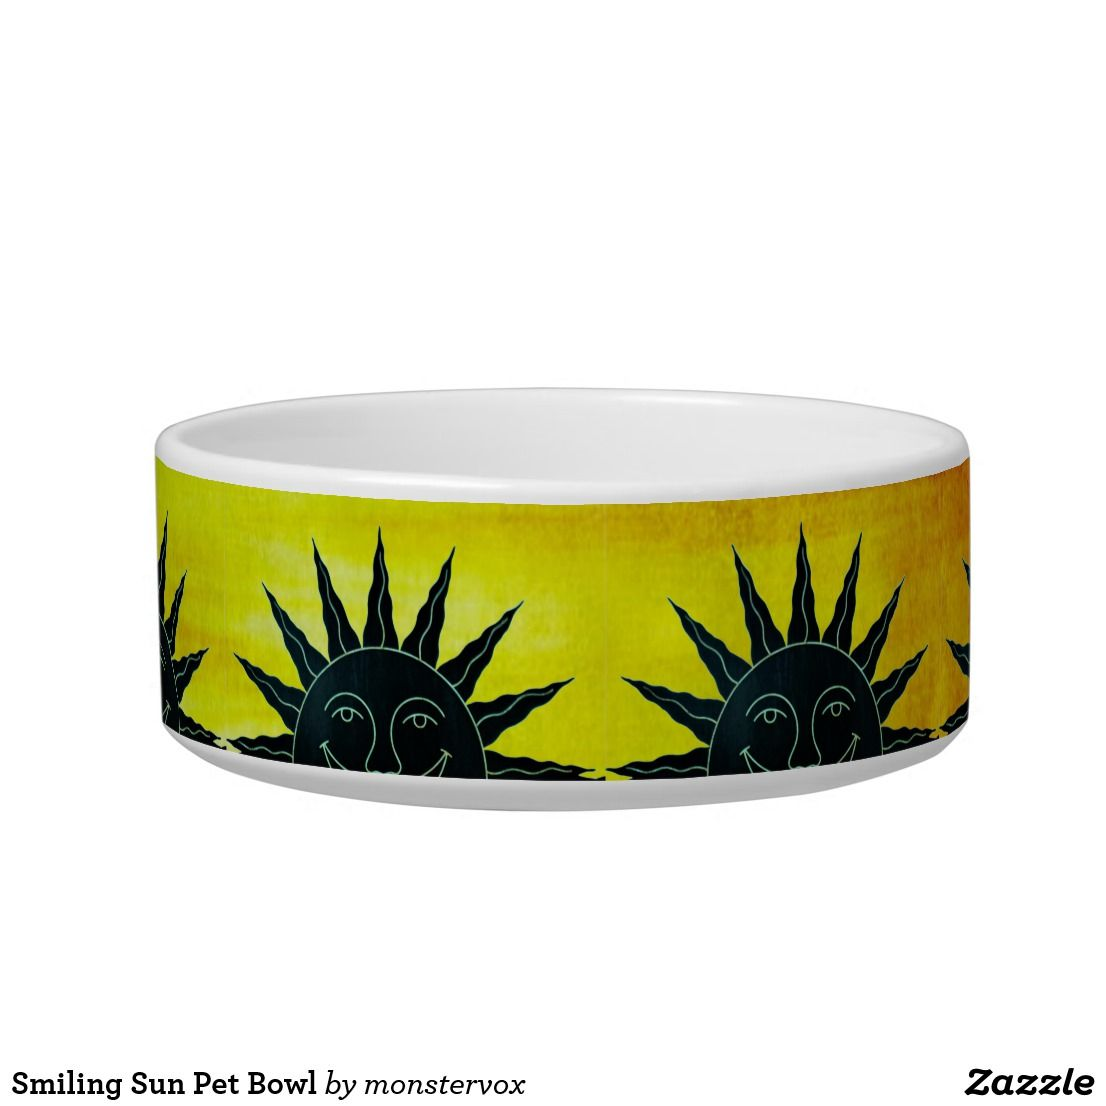 Smiling Sun Pet Bowl